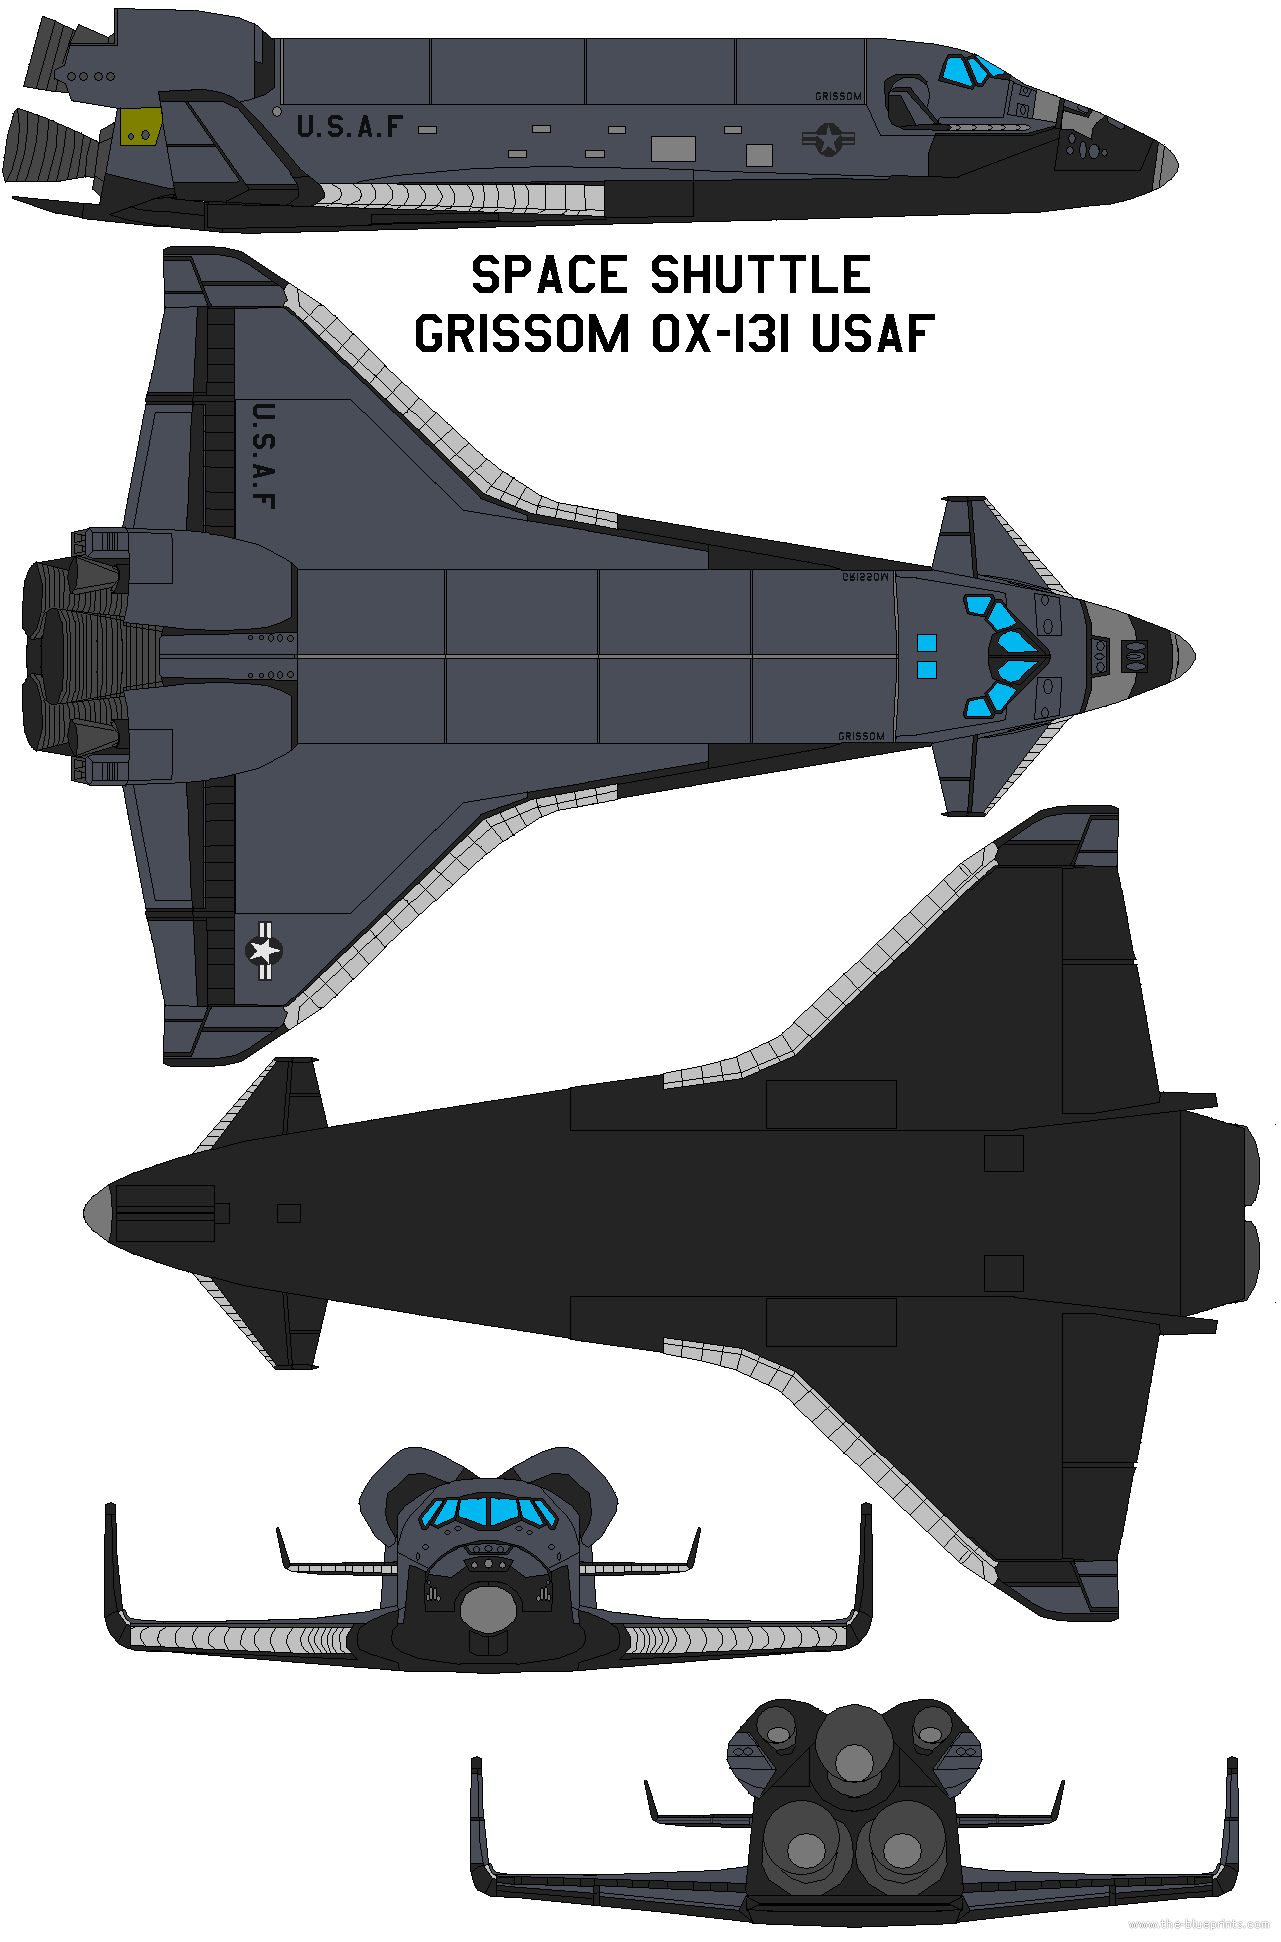 Submit Vat Online >> Blueprints > Modern airplanes > Modern Sa-St > Space shuttle Grissom OX-131 USAF